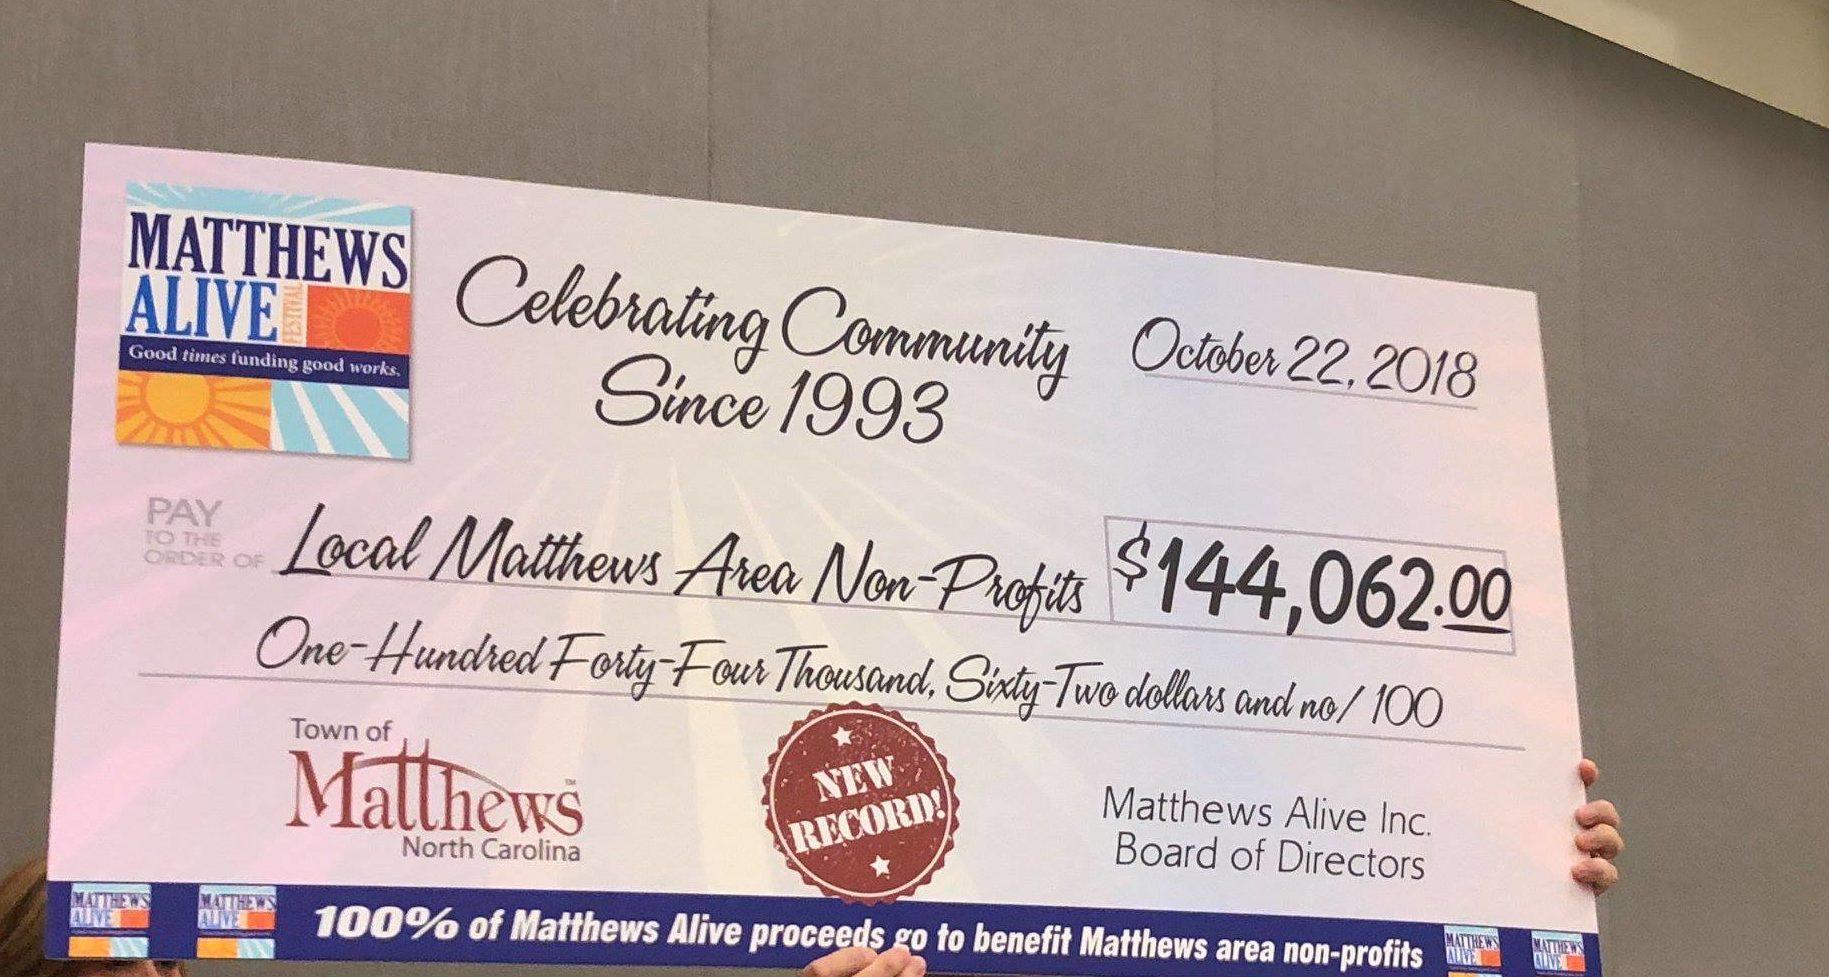 Matthews Alive check